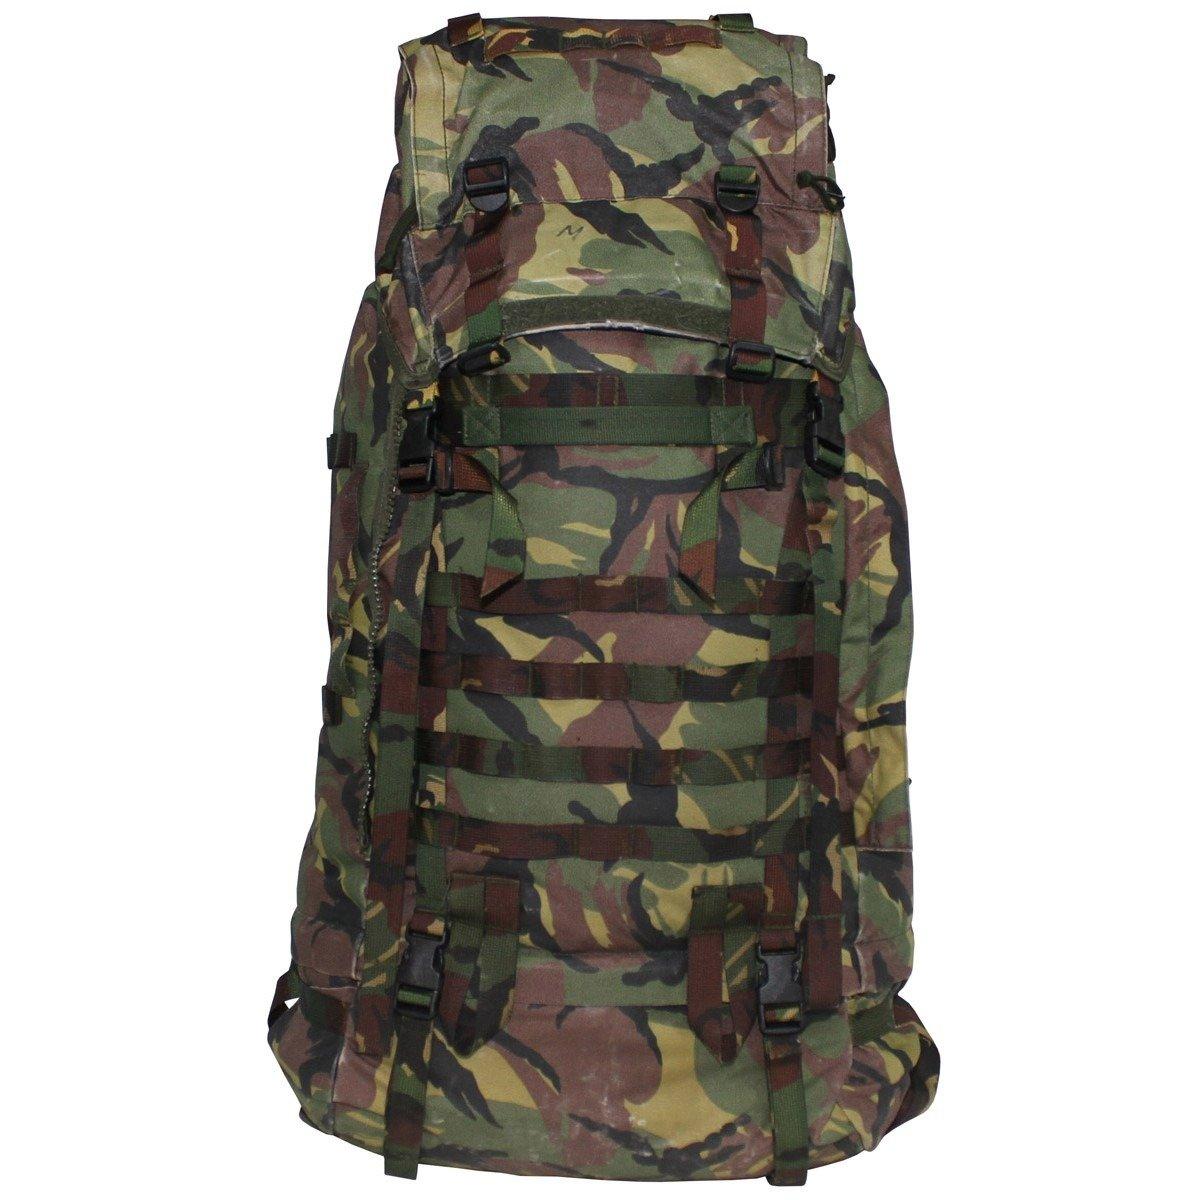 nl backpack large nl camo without side pockets used. Black Bedroom Furniture Sets. Home Design Ideas